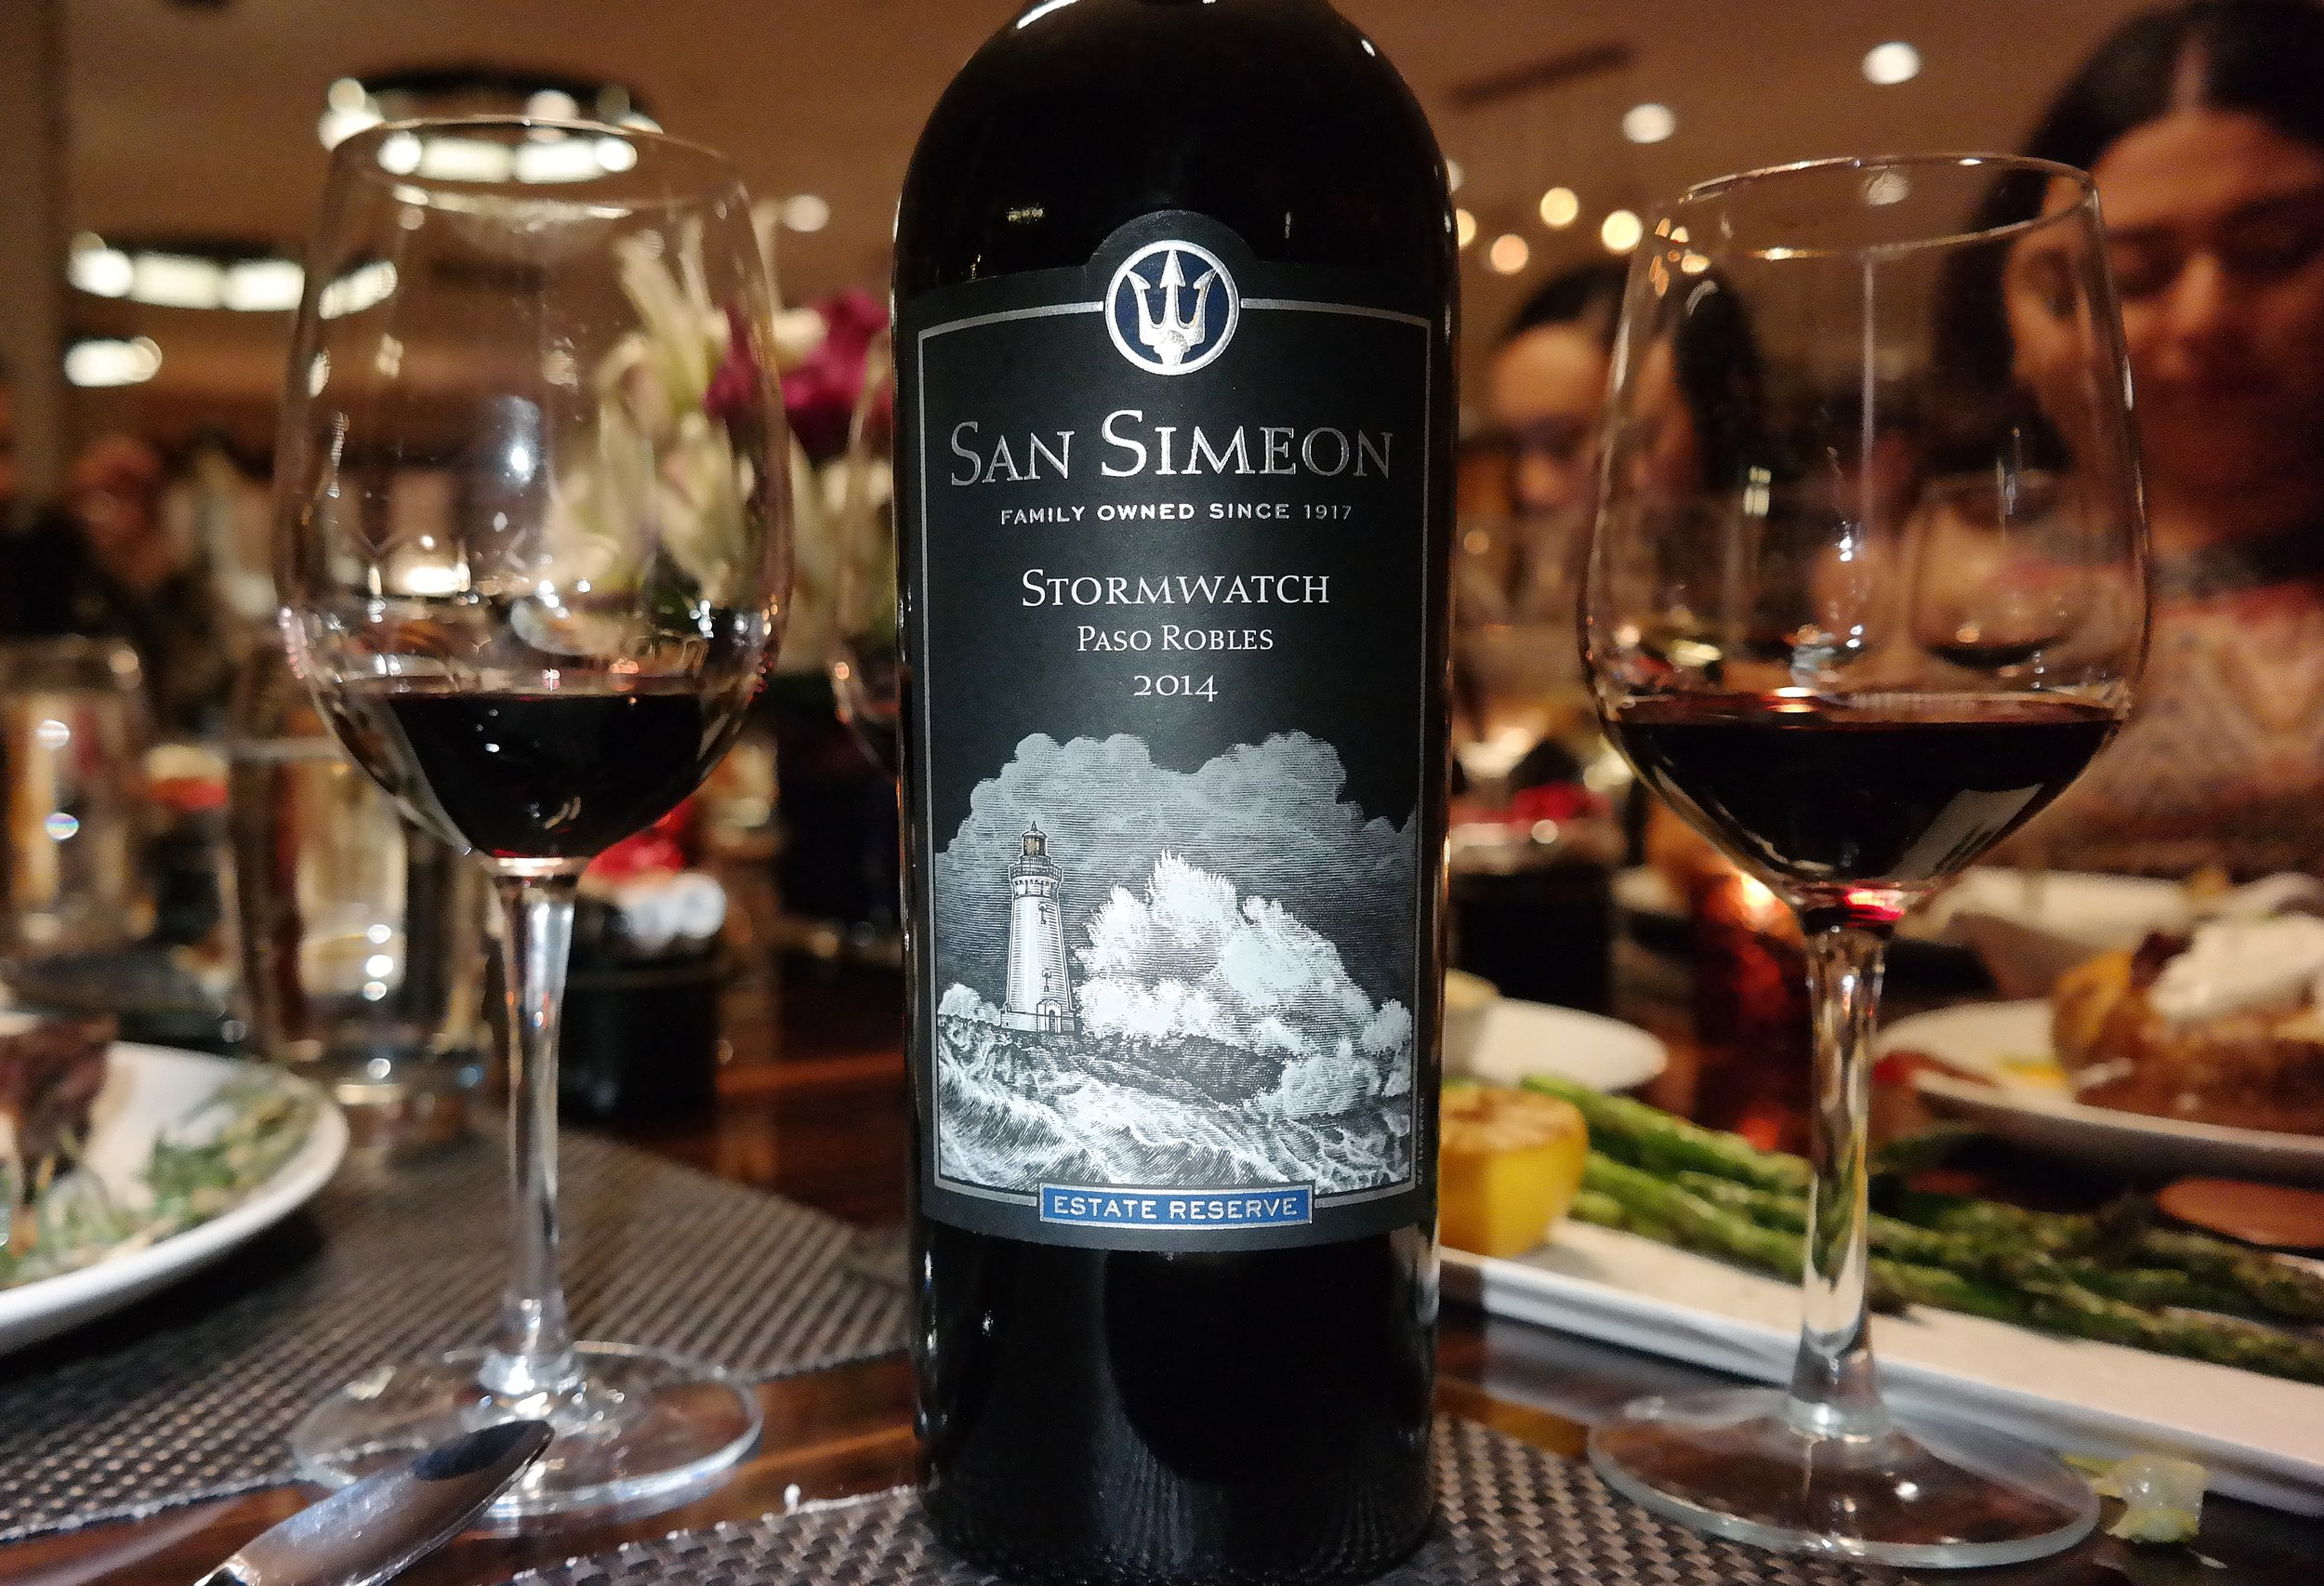 Stormwatcher wine